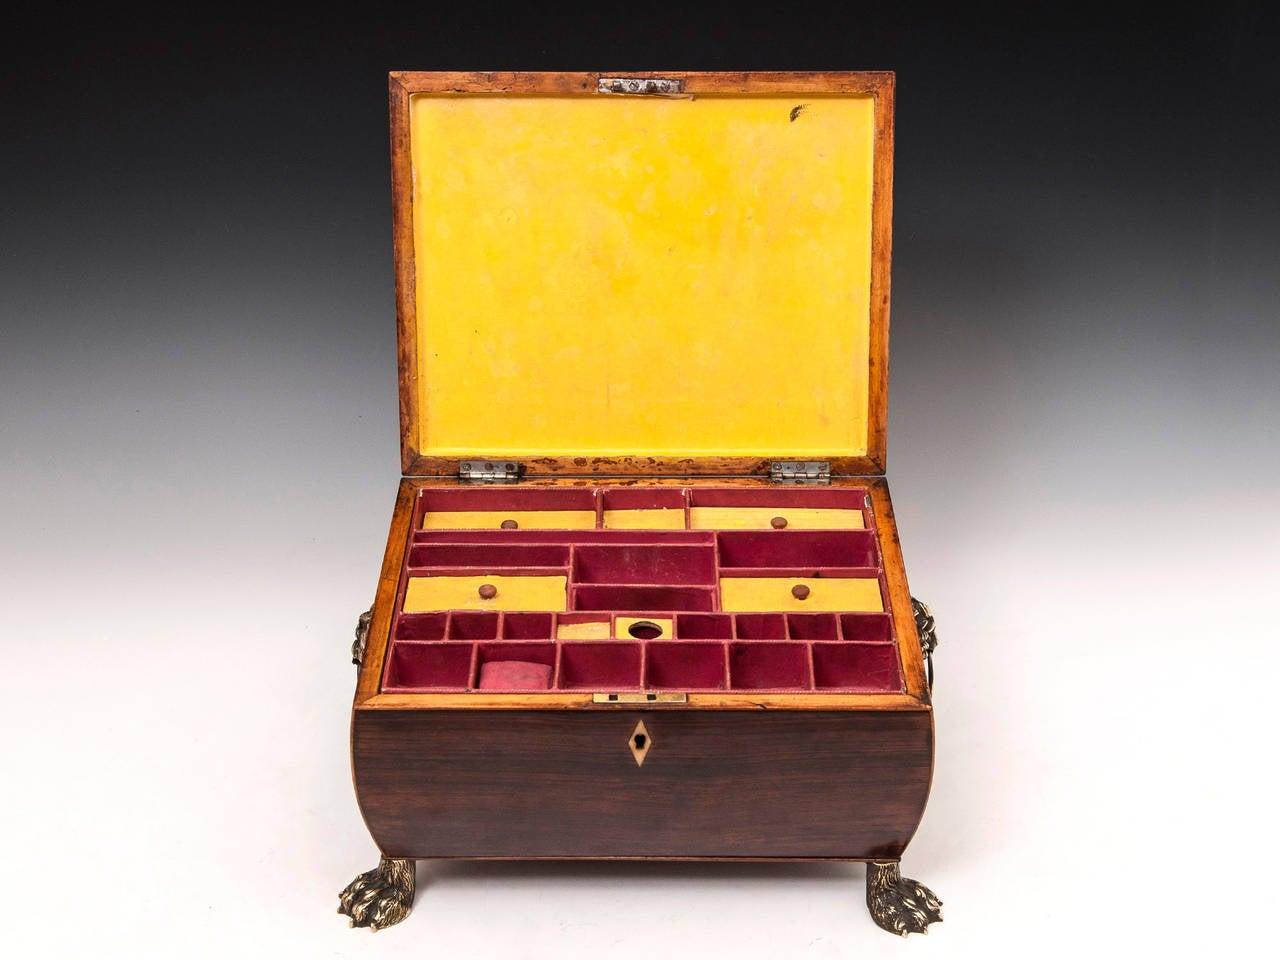 19th Century Regency Bombe Shape Mahogany Sewing Box For Sale 3